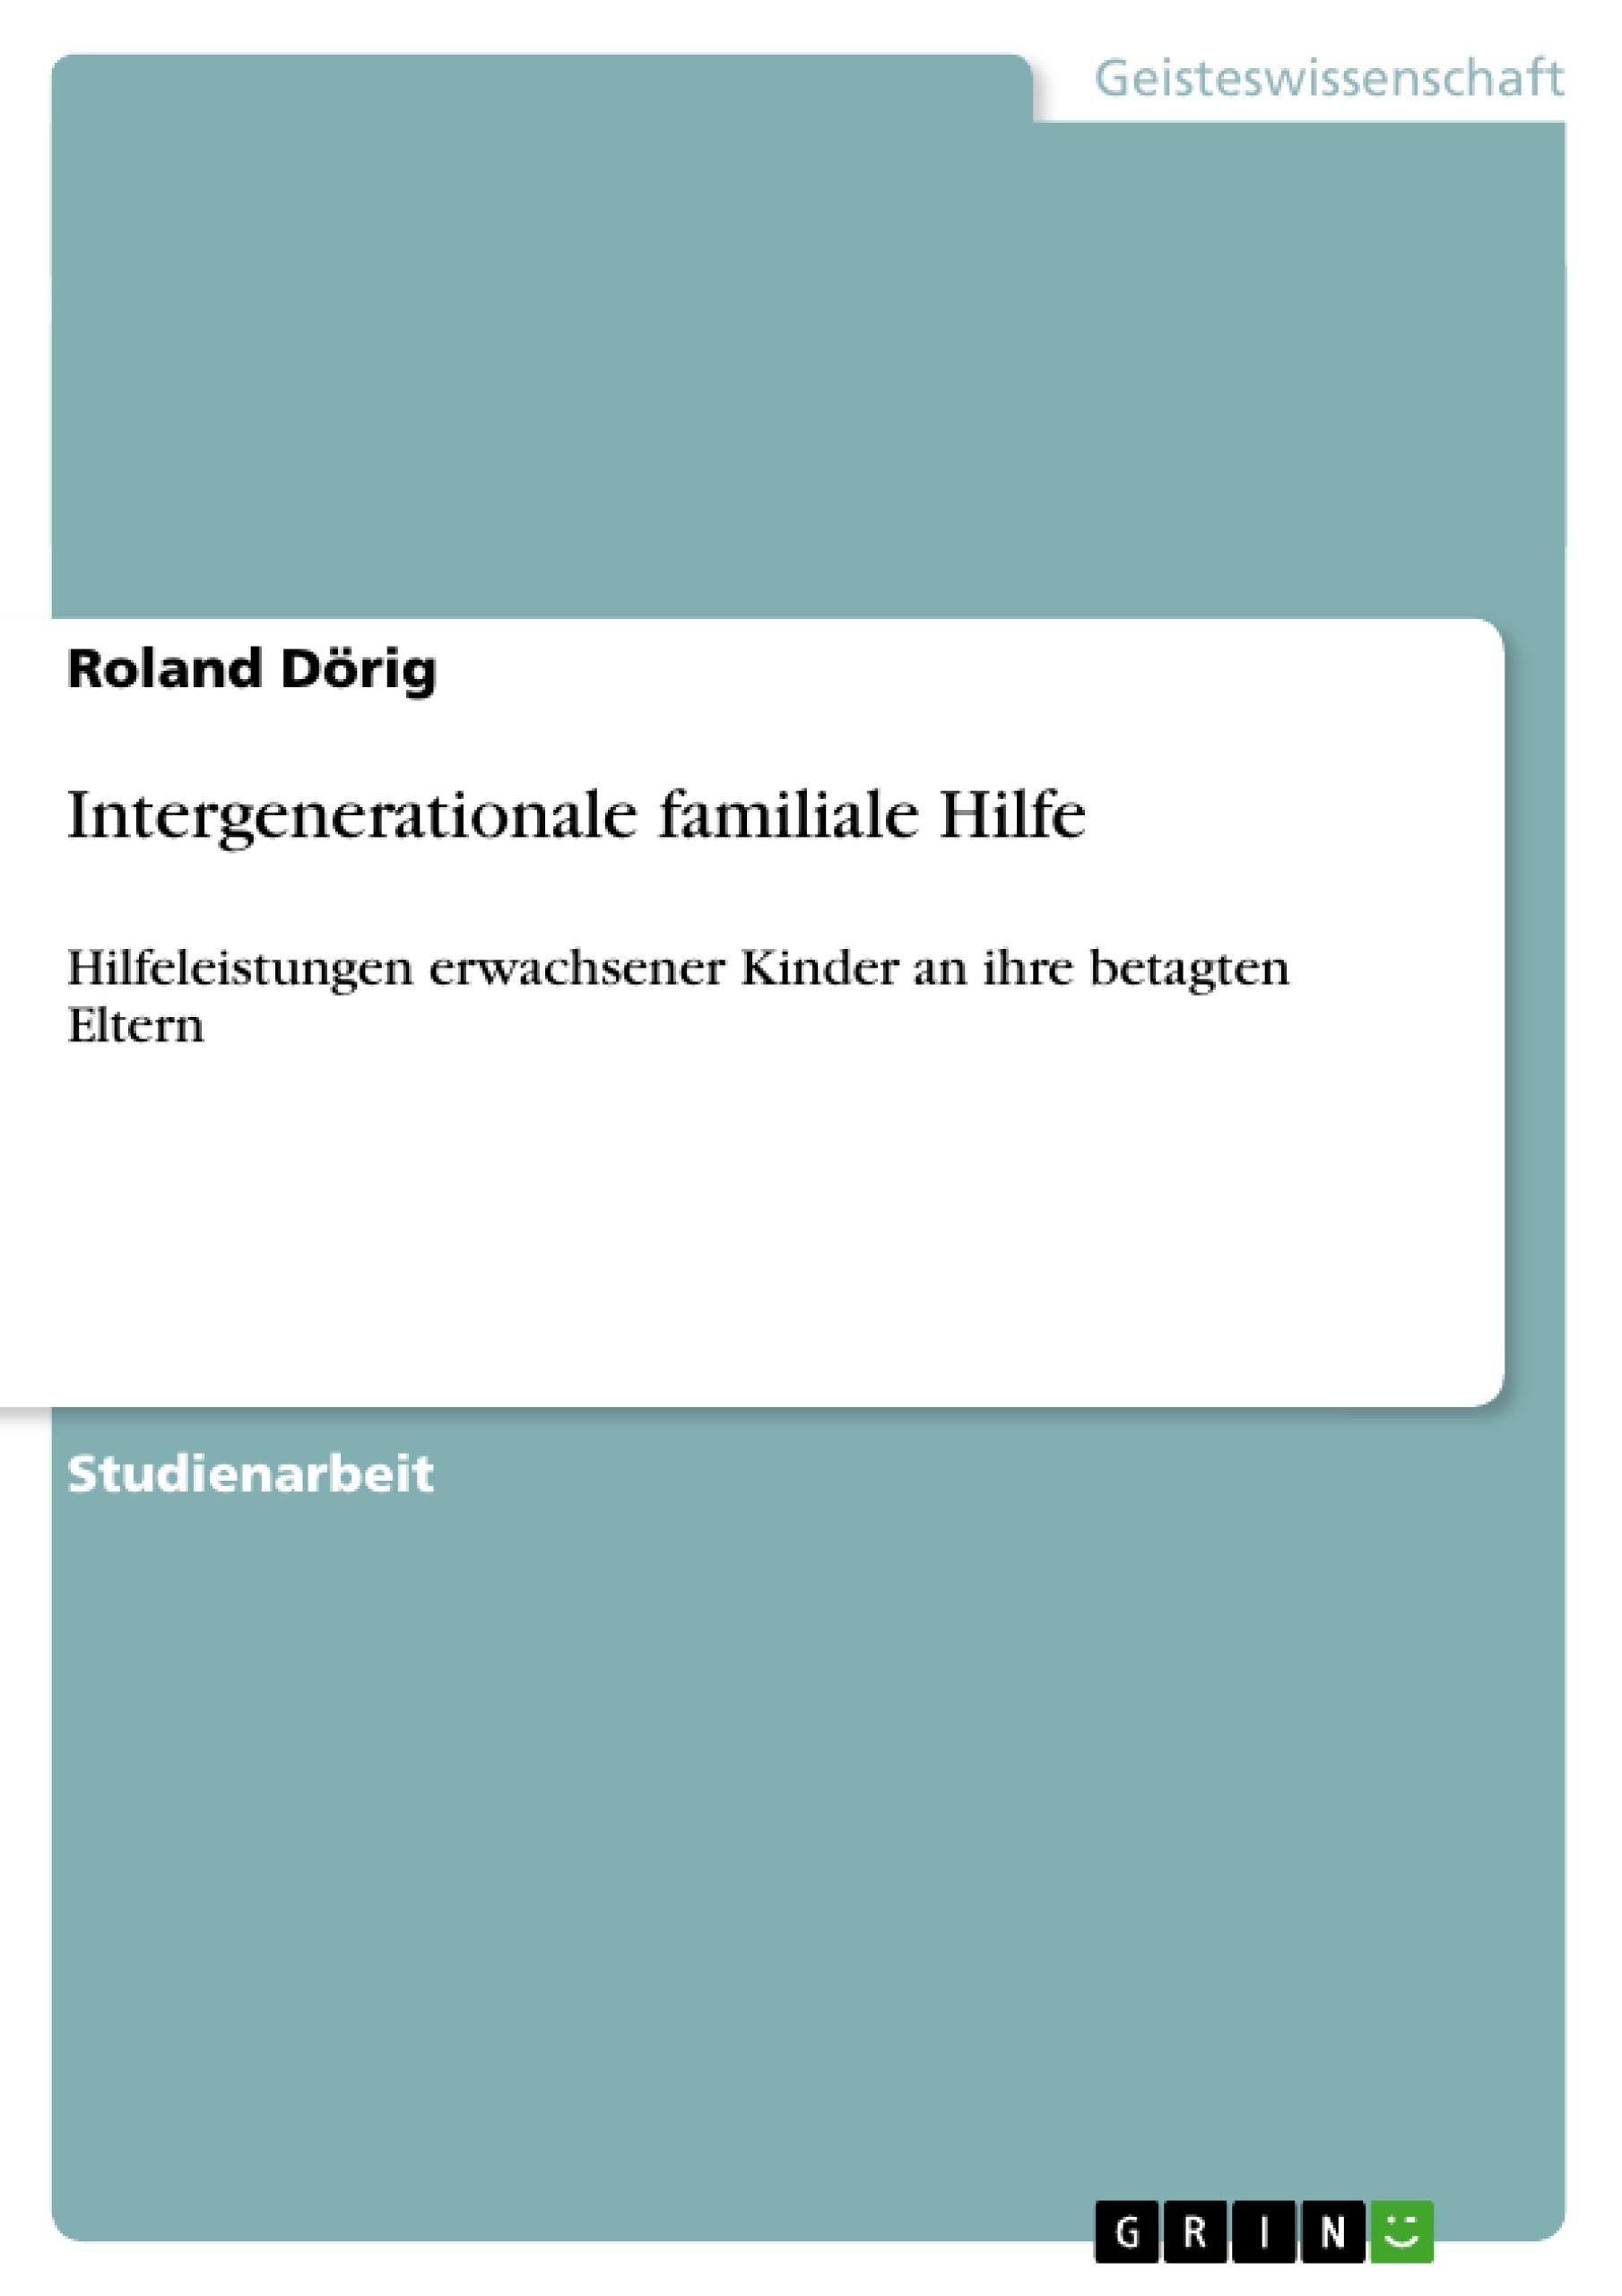 Titel: Intergenerationale familiale Hilfe